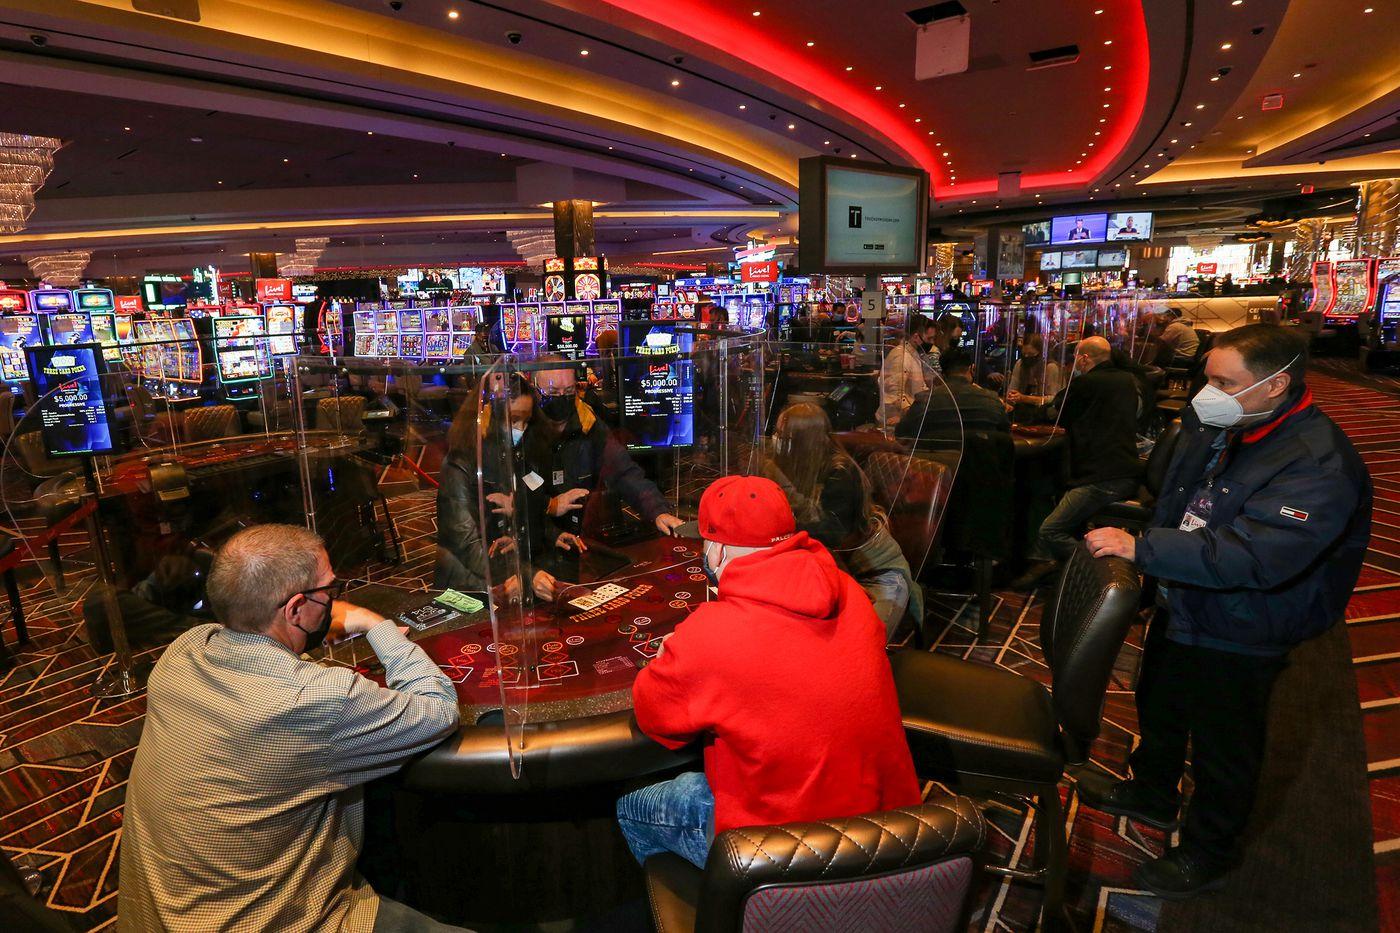 Eagles charity casino vegas casino deals free stuff